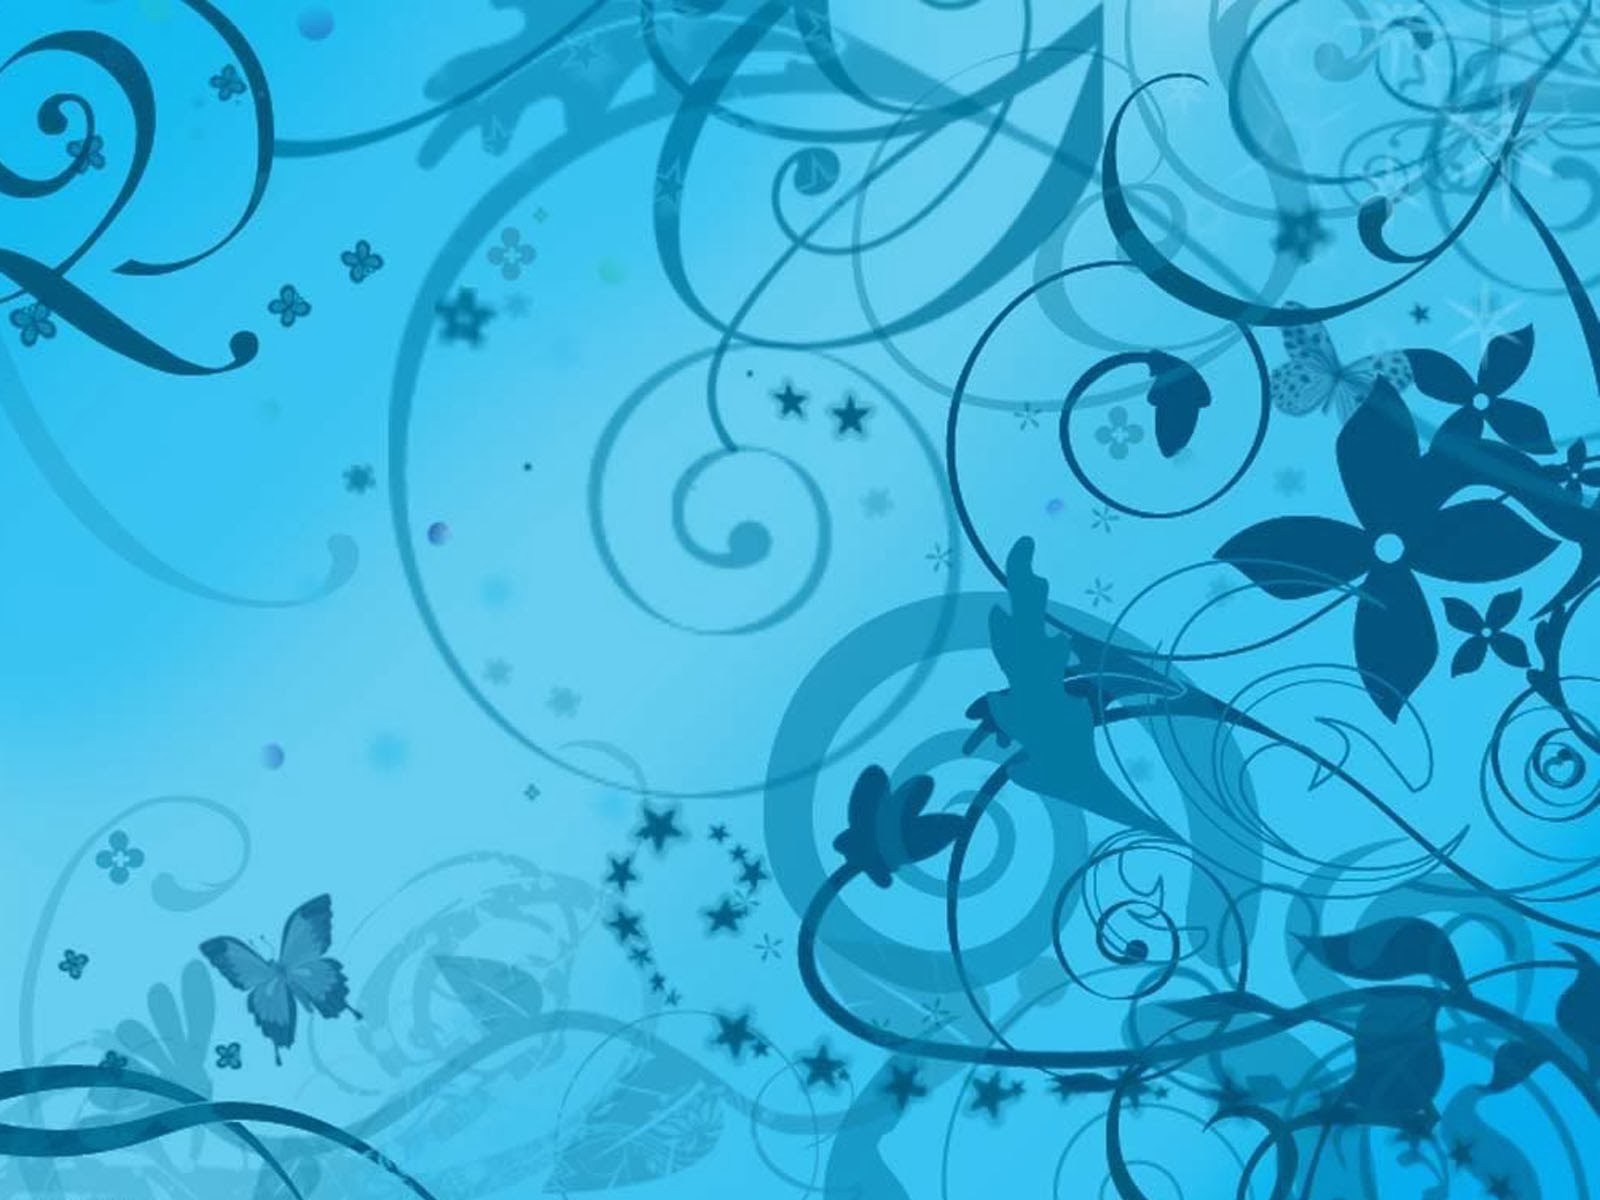 wallpapers: Swirls Wallpapers